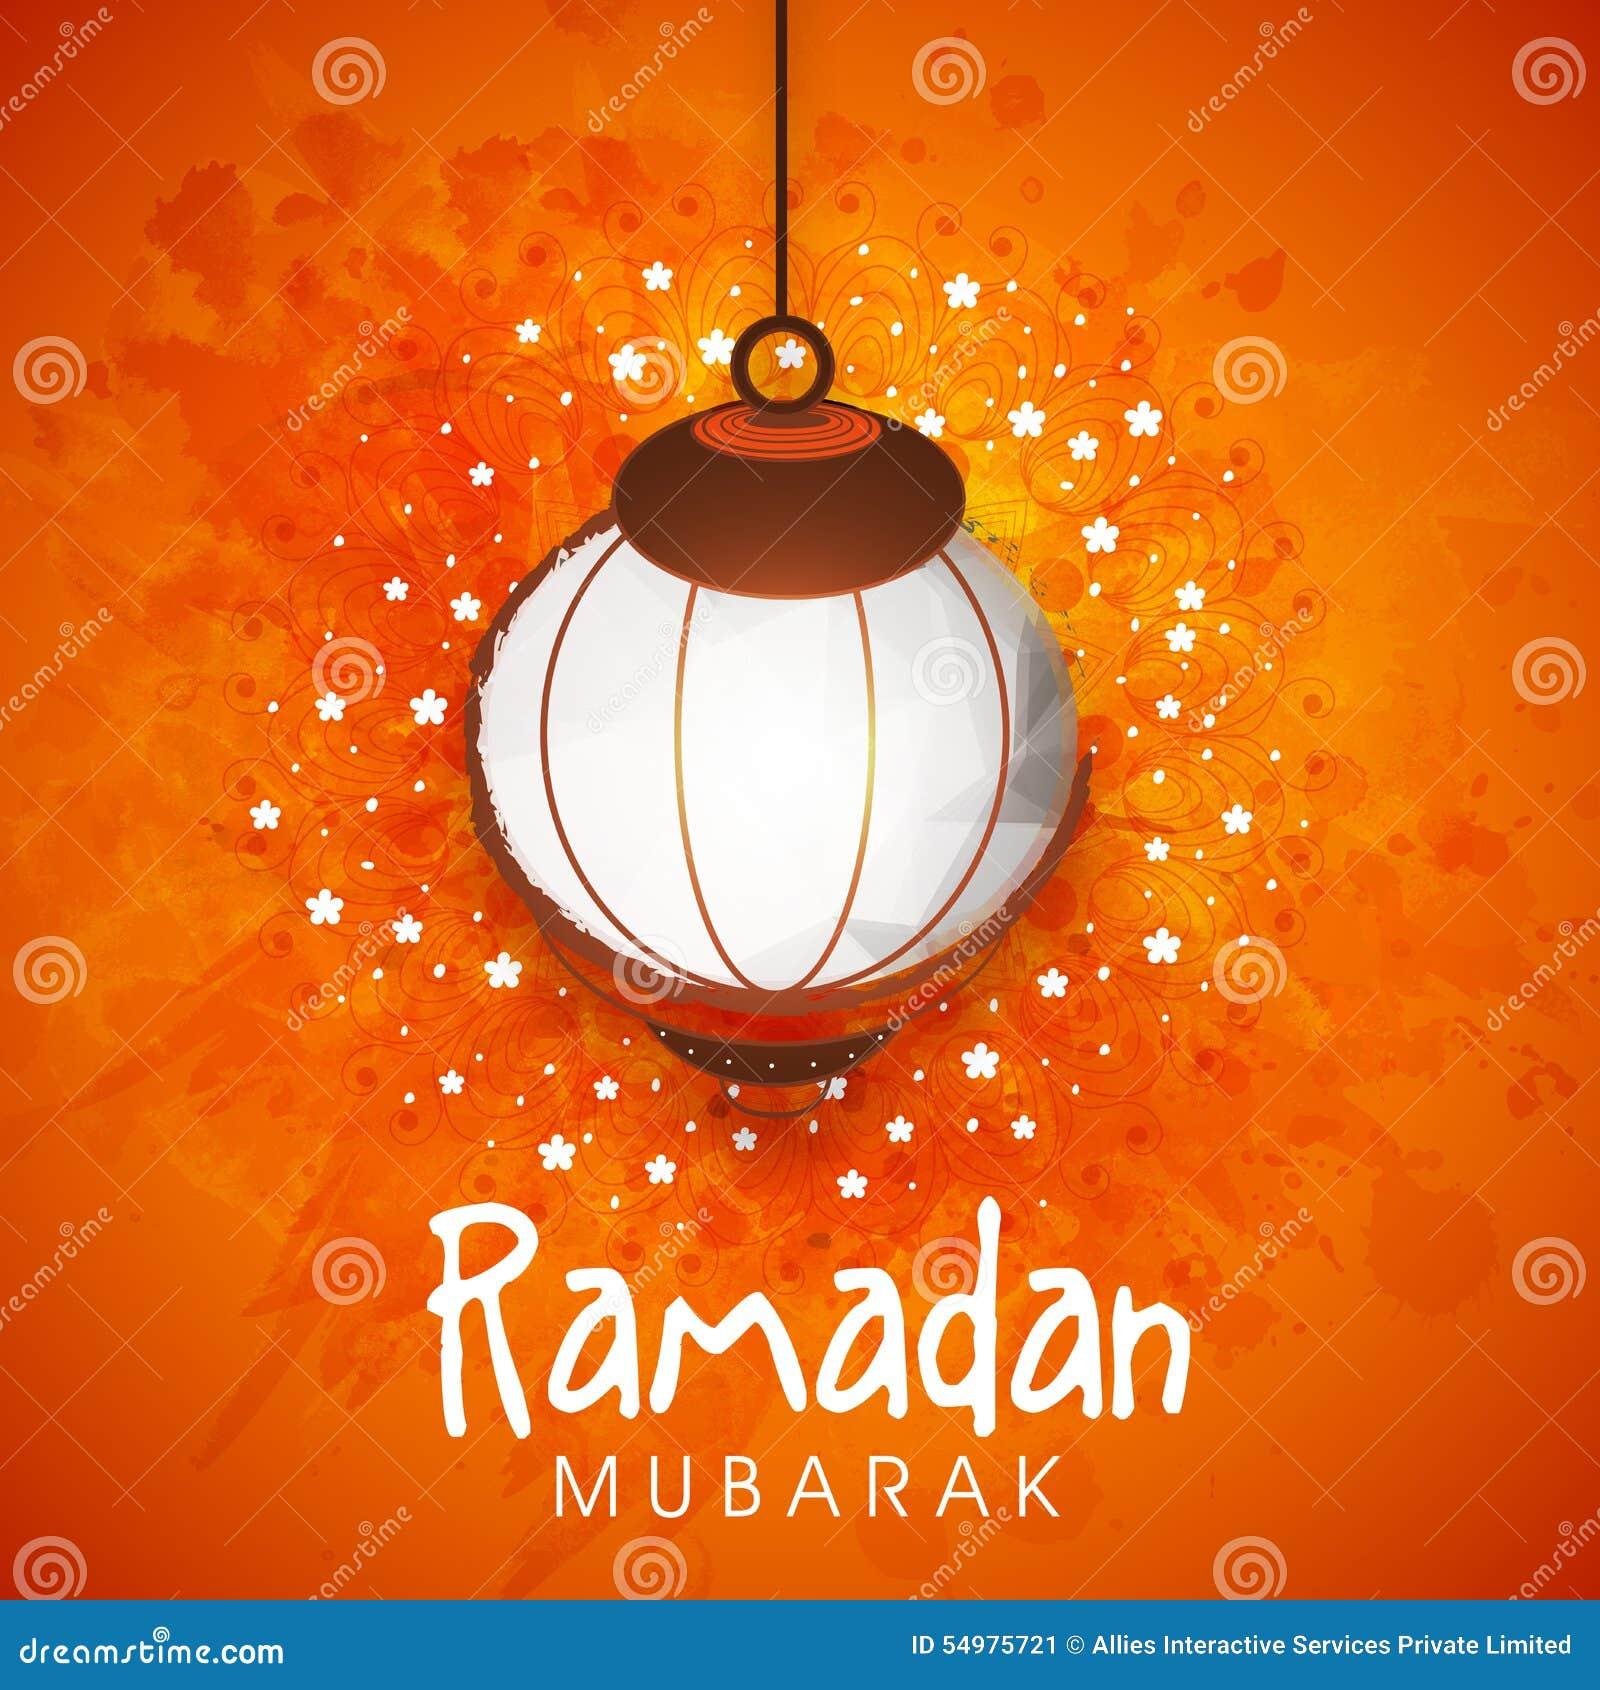 Lanterne créative pour la célébration de Ramadan Mubarak